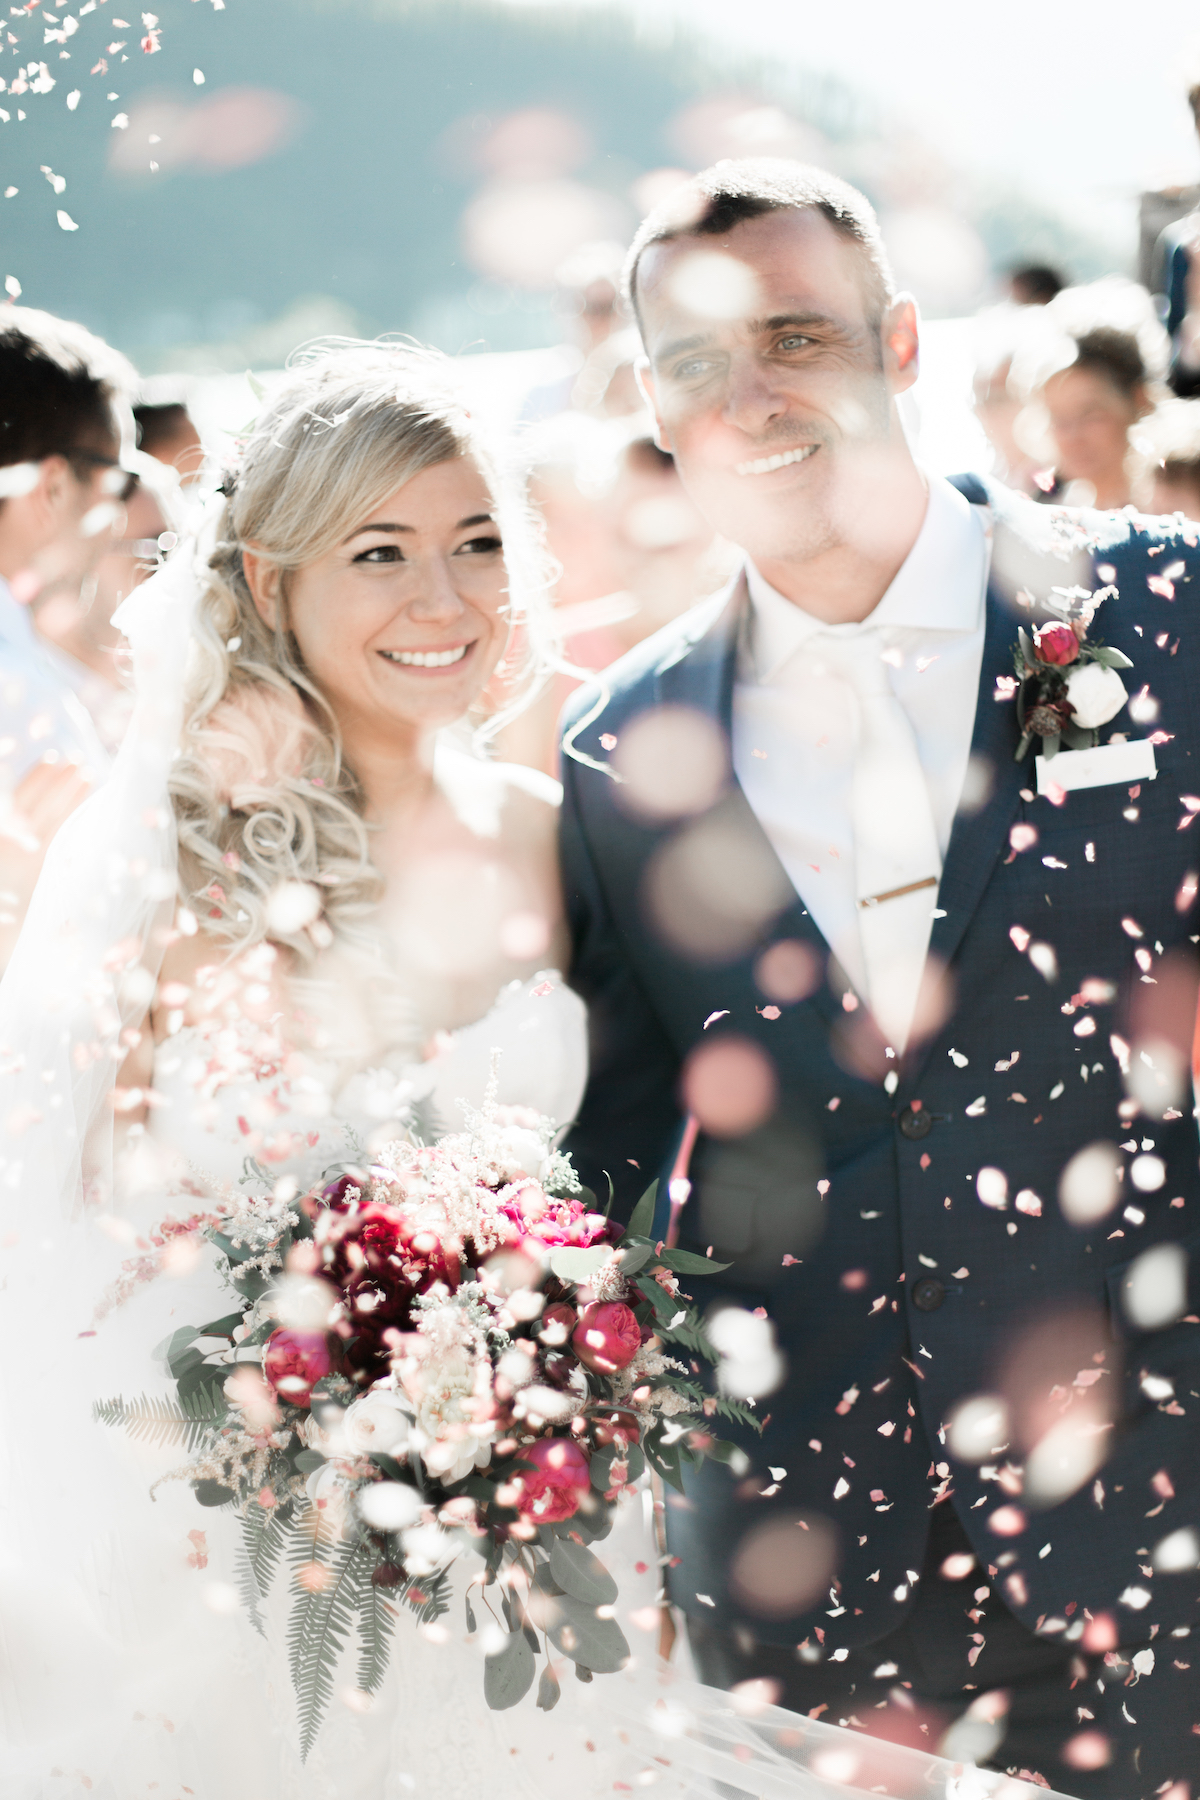 annecy-wedding-photos-142.jpg